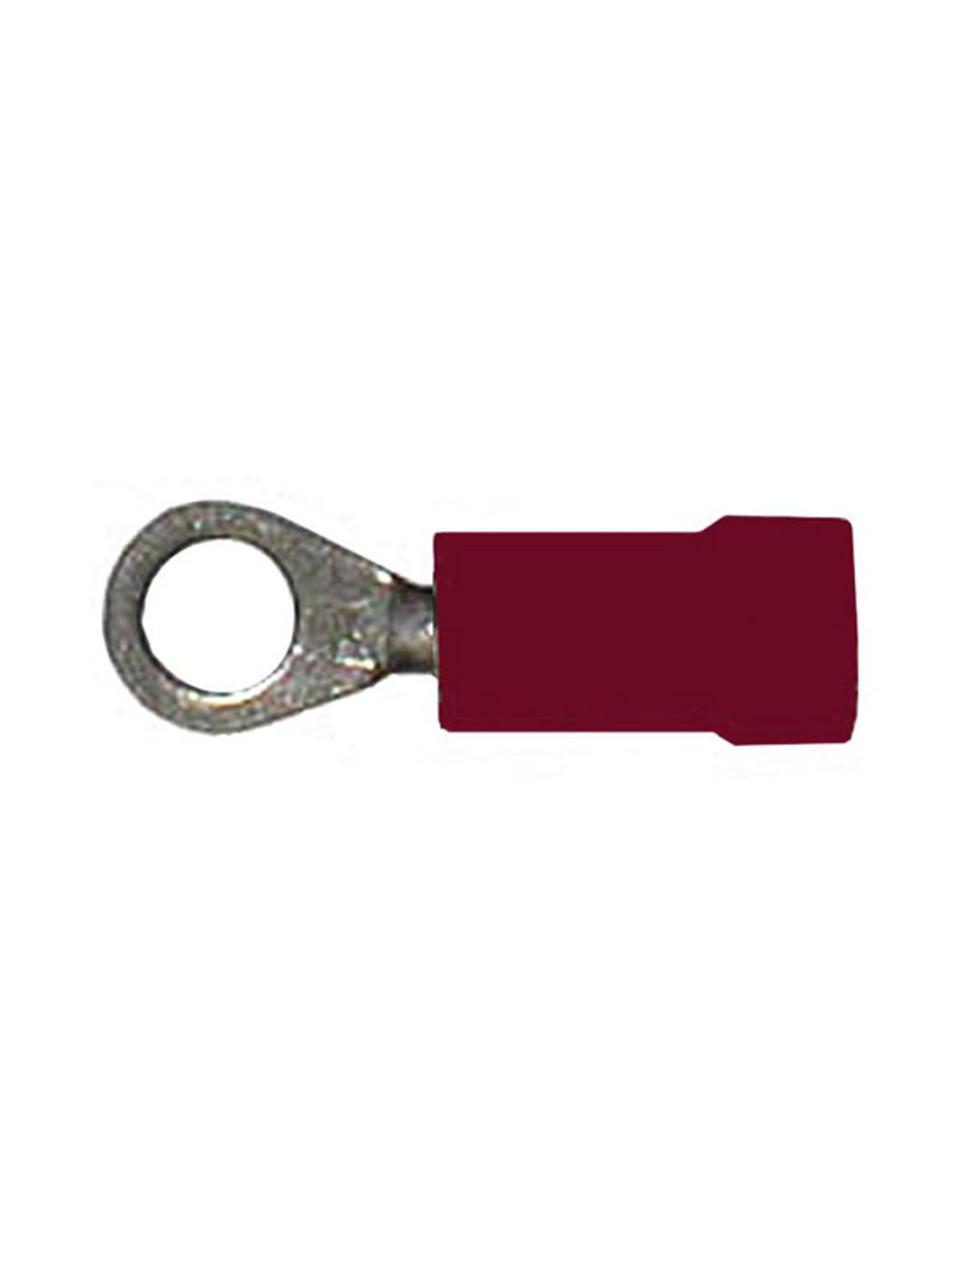 RR-8 --- Red Ring # 8 Terminal